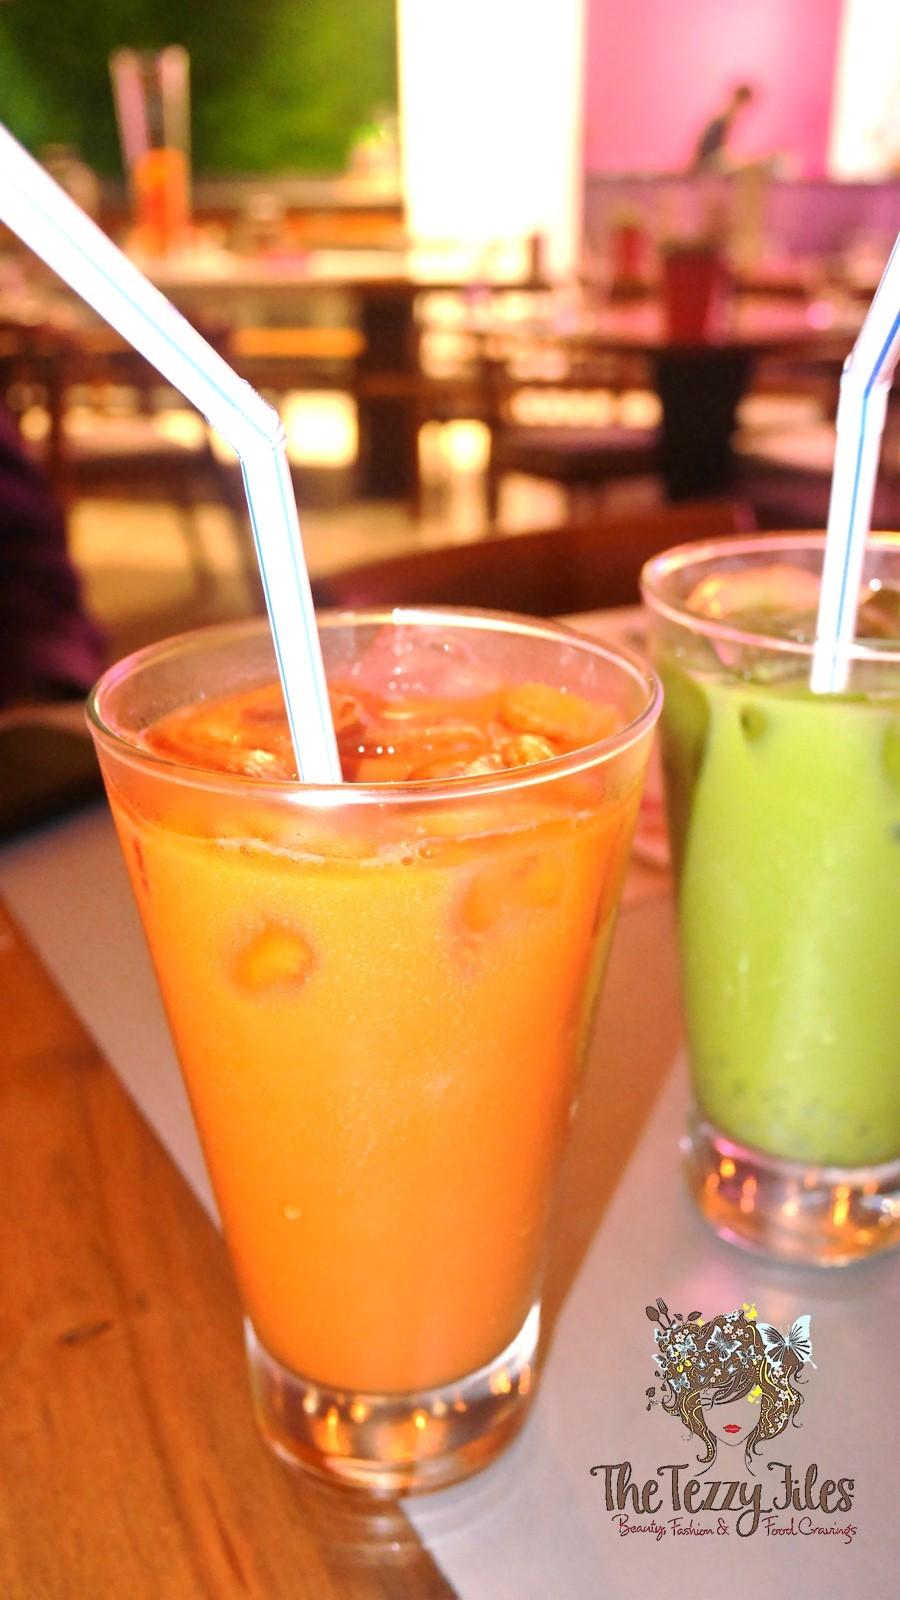 Fuchsia Dubai Thai Restaurant Business Bay Barsha Review by The Tezzy Files Dubai Food Blog Blogger Zomato (12)